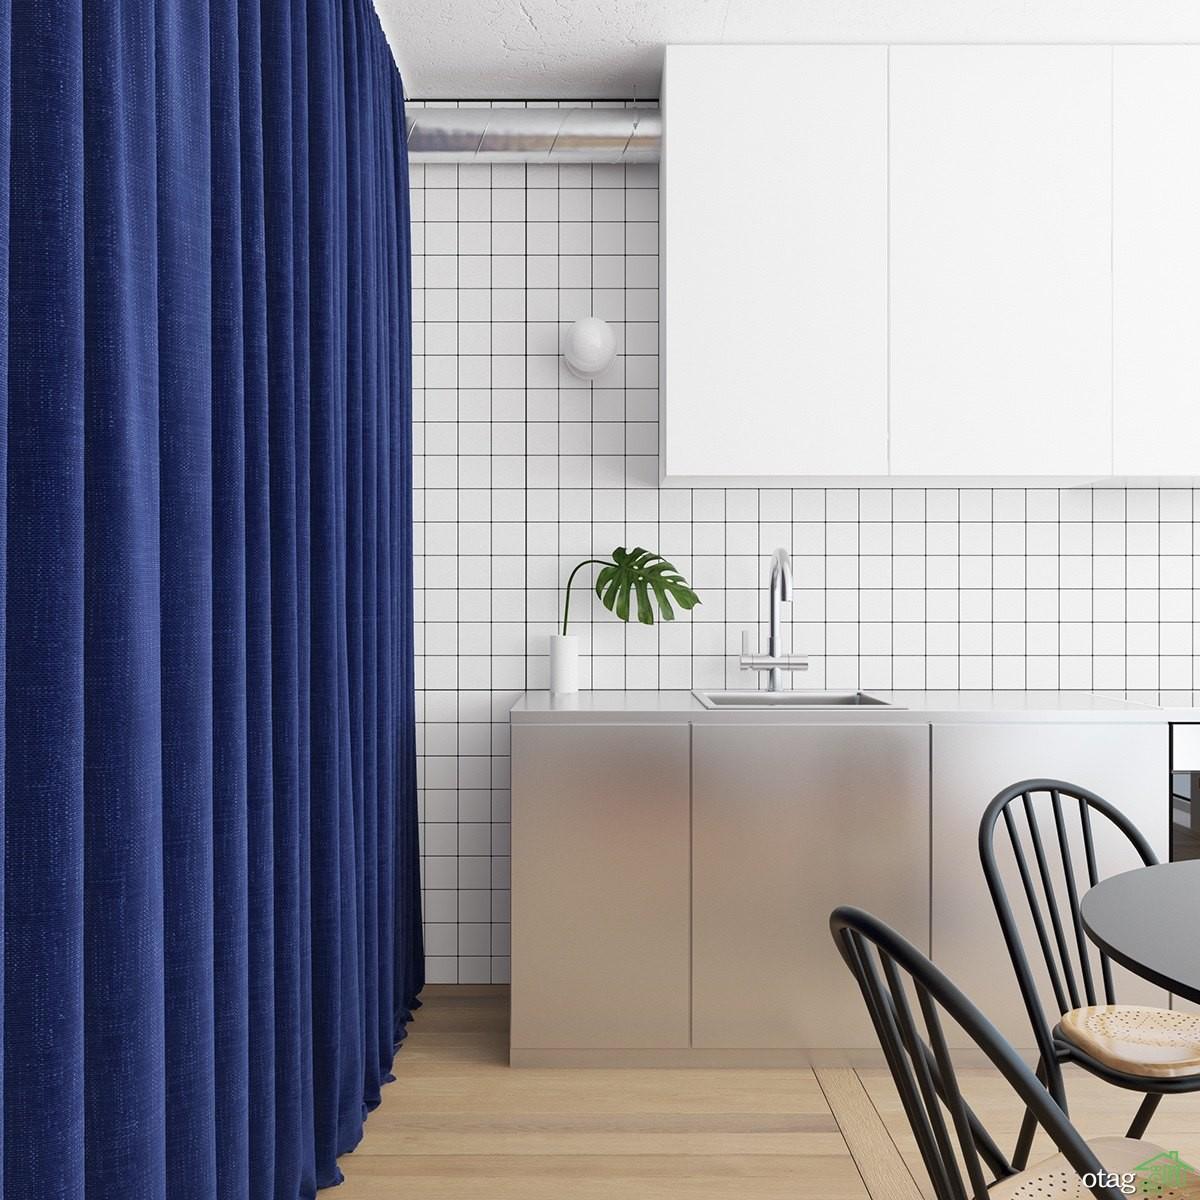 آپارتمان-شیک-کوچک (1)